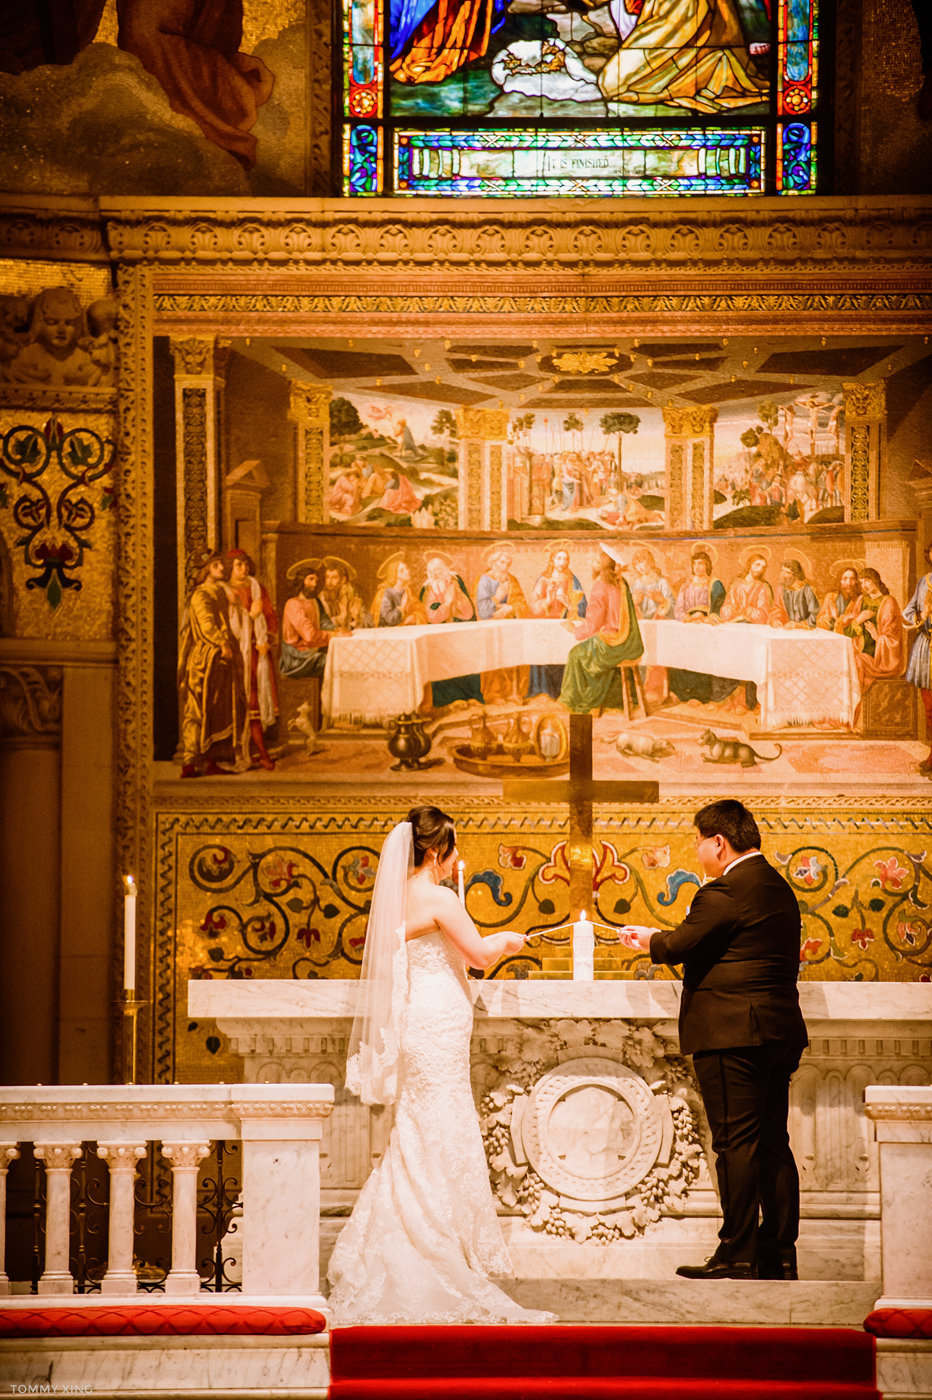 STANFORD MEMORIAL CHURCH WEDDING - Wenjie & Chengcheng - SAN FRANCISCO BAY AREA 斯坦福教堂婚礼跟拍 - 洛杉矶婚礼婚纱照摄影师 Tommy Xing Photography108.jpg